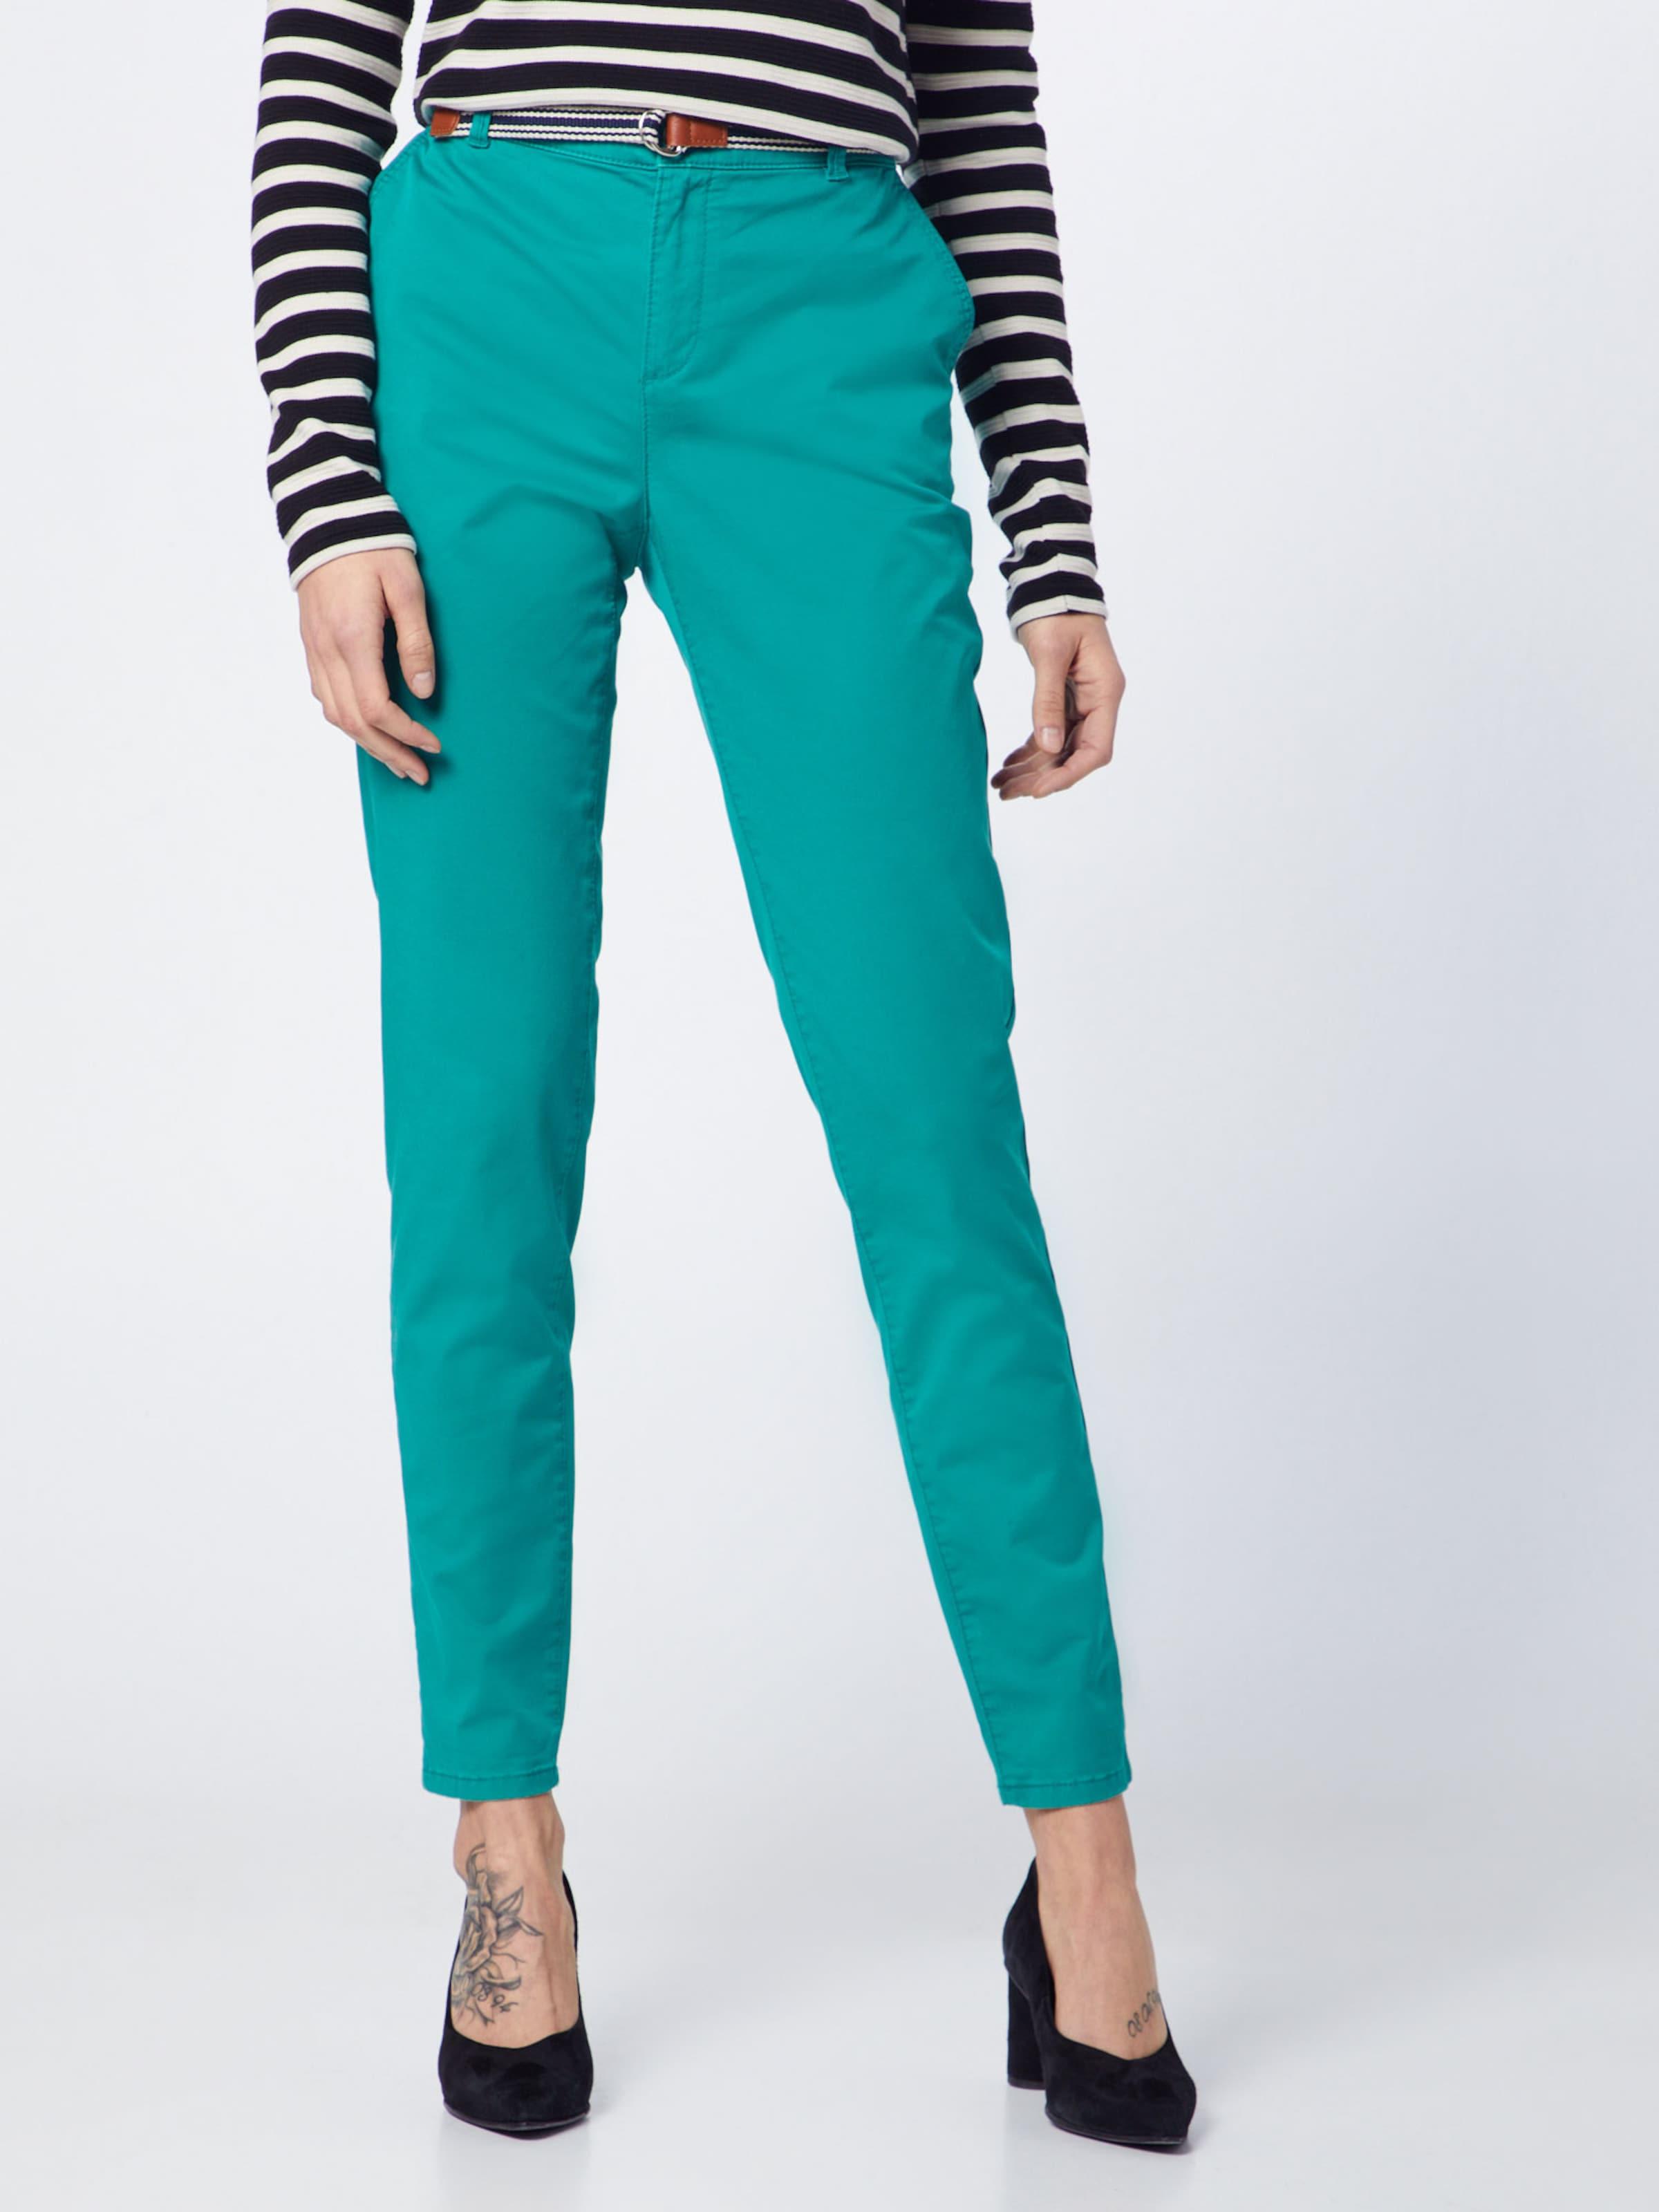 Chino Pantalon Esprit Pantalon Esprit Jade Chino En yv6YgI7bf